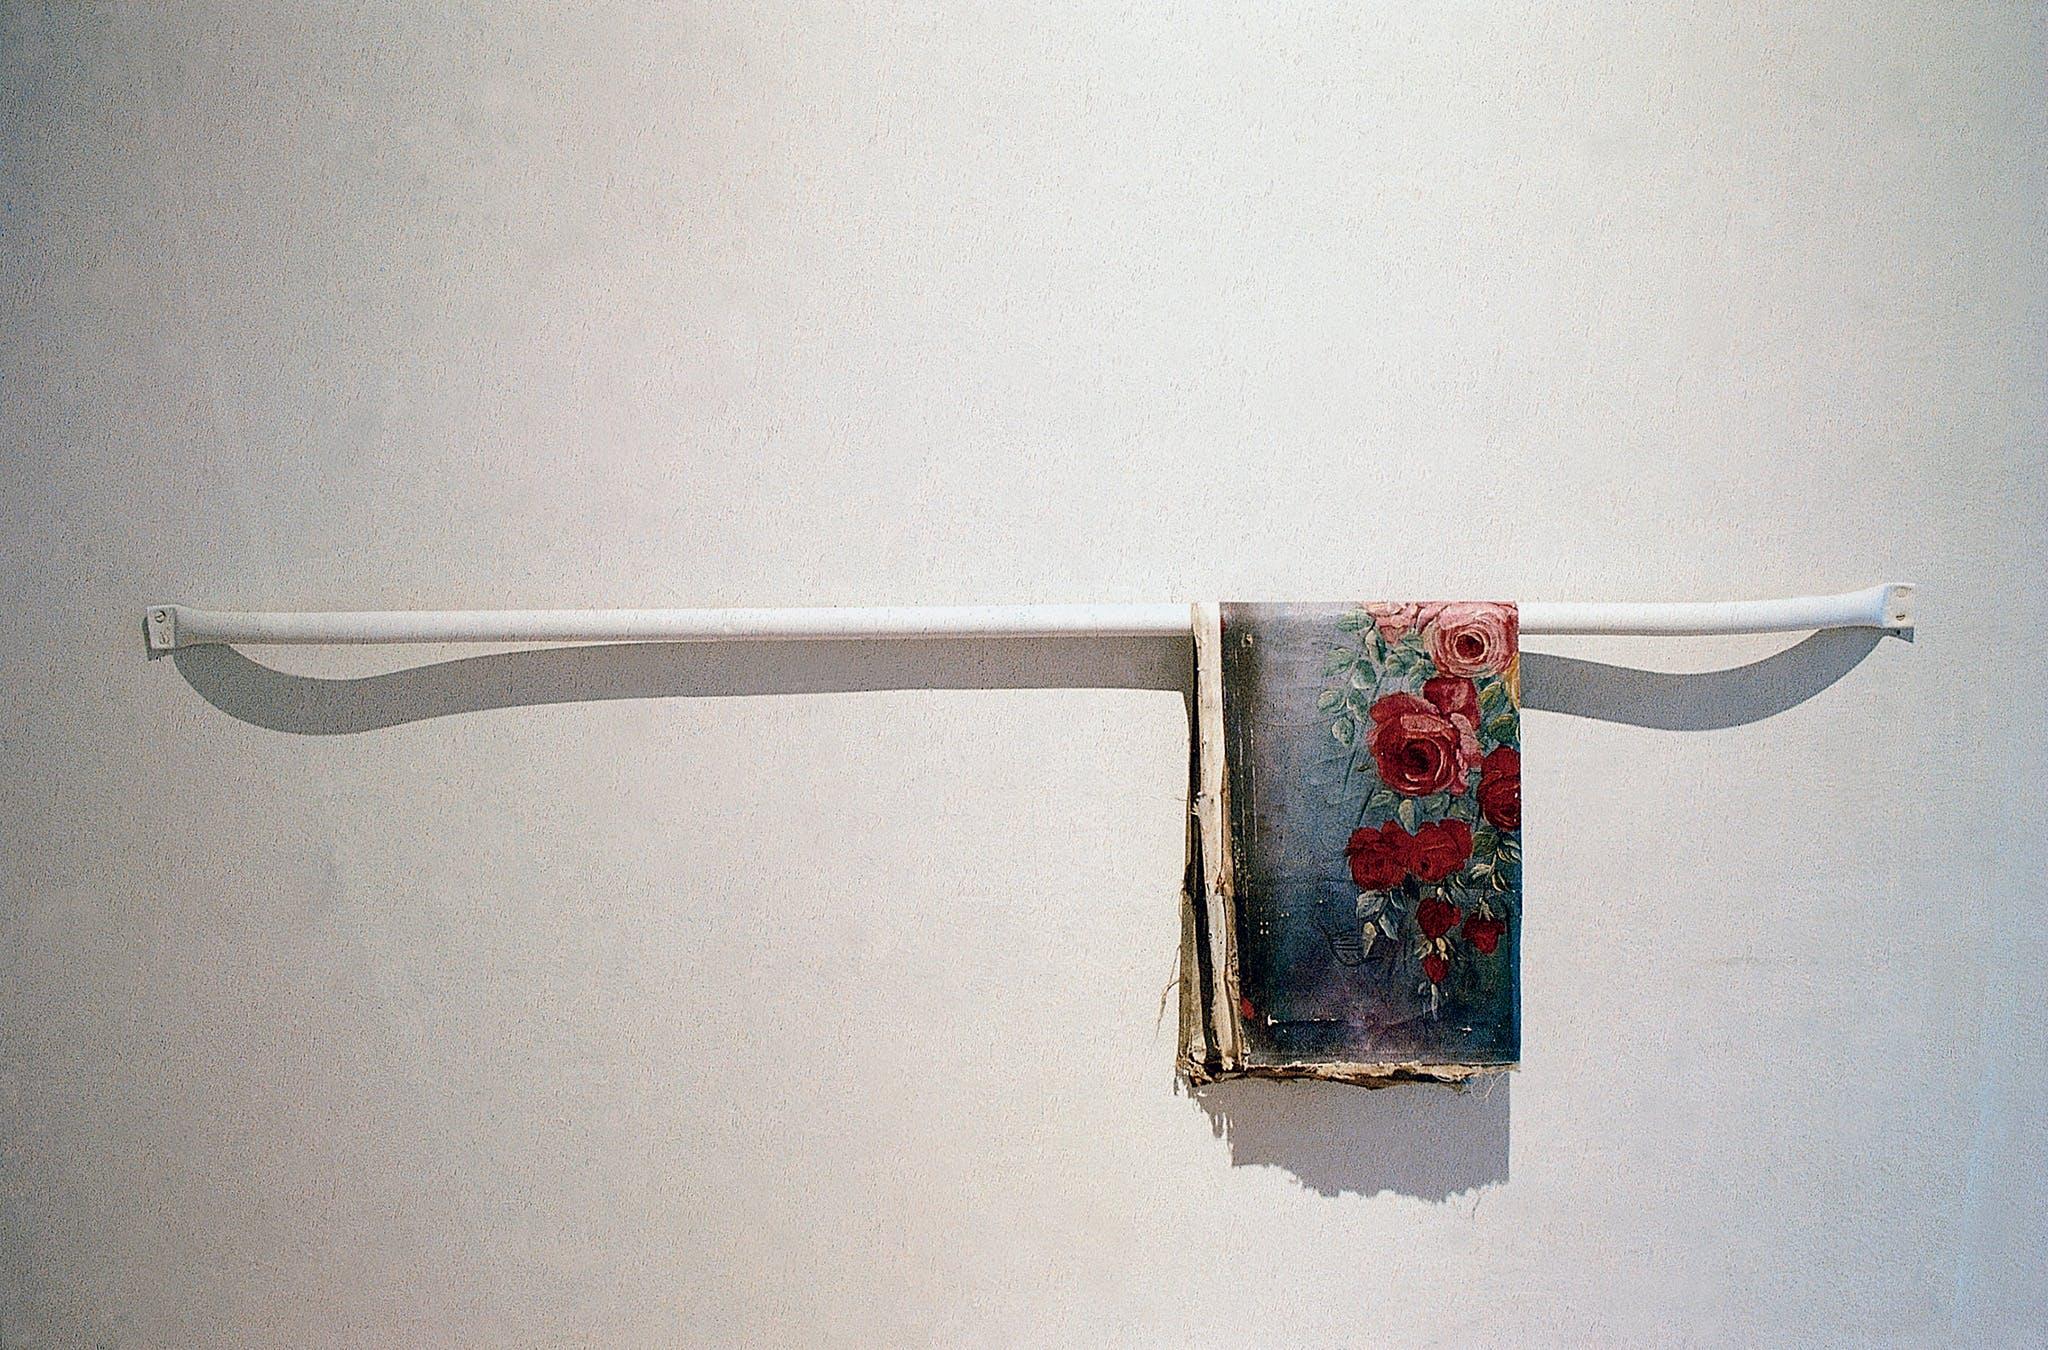 Abraham Cruzvillegas, Objecto útil pero bonito, 1992